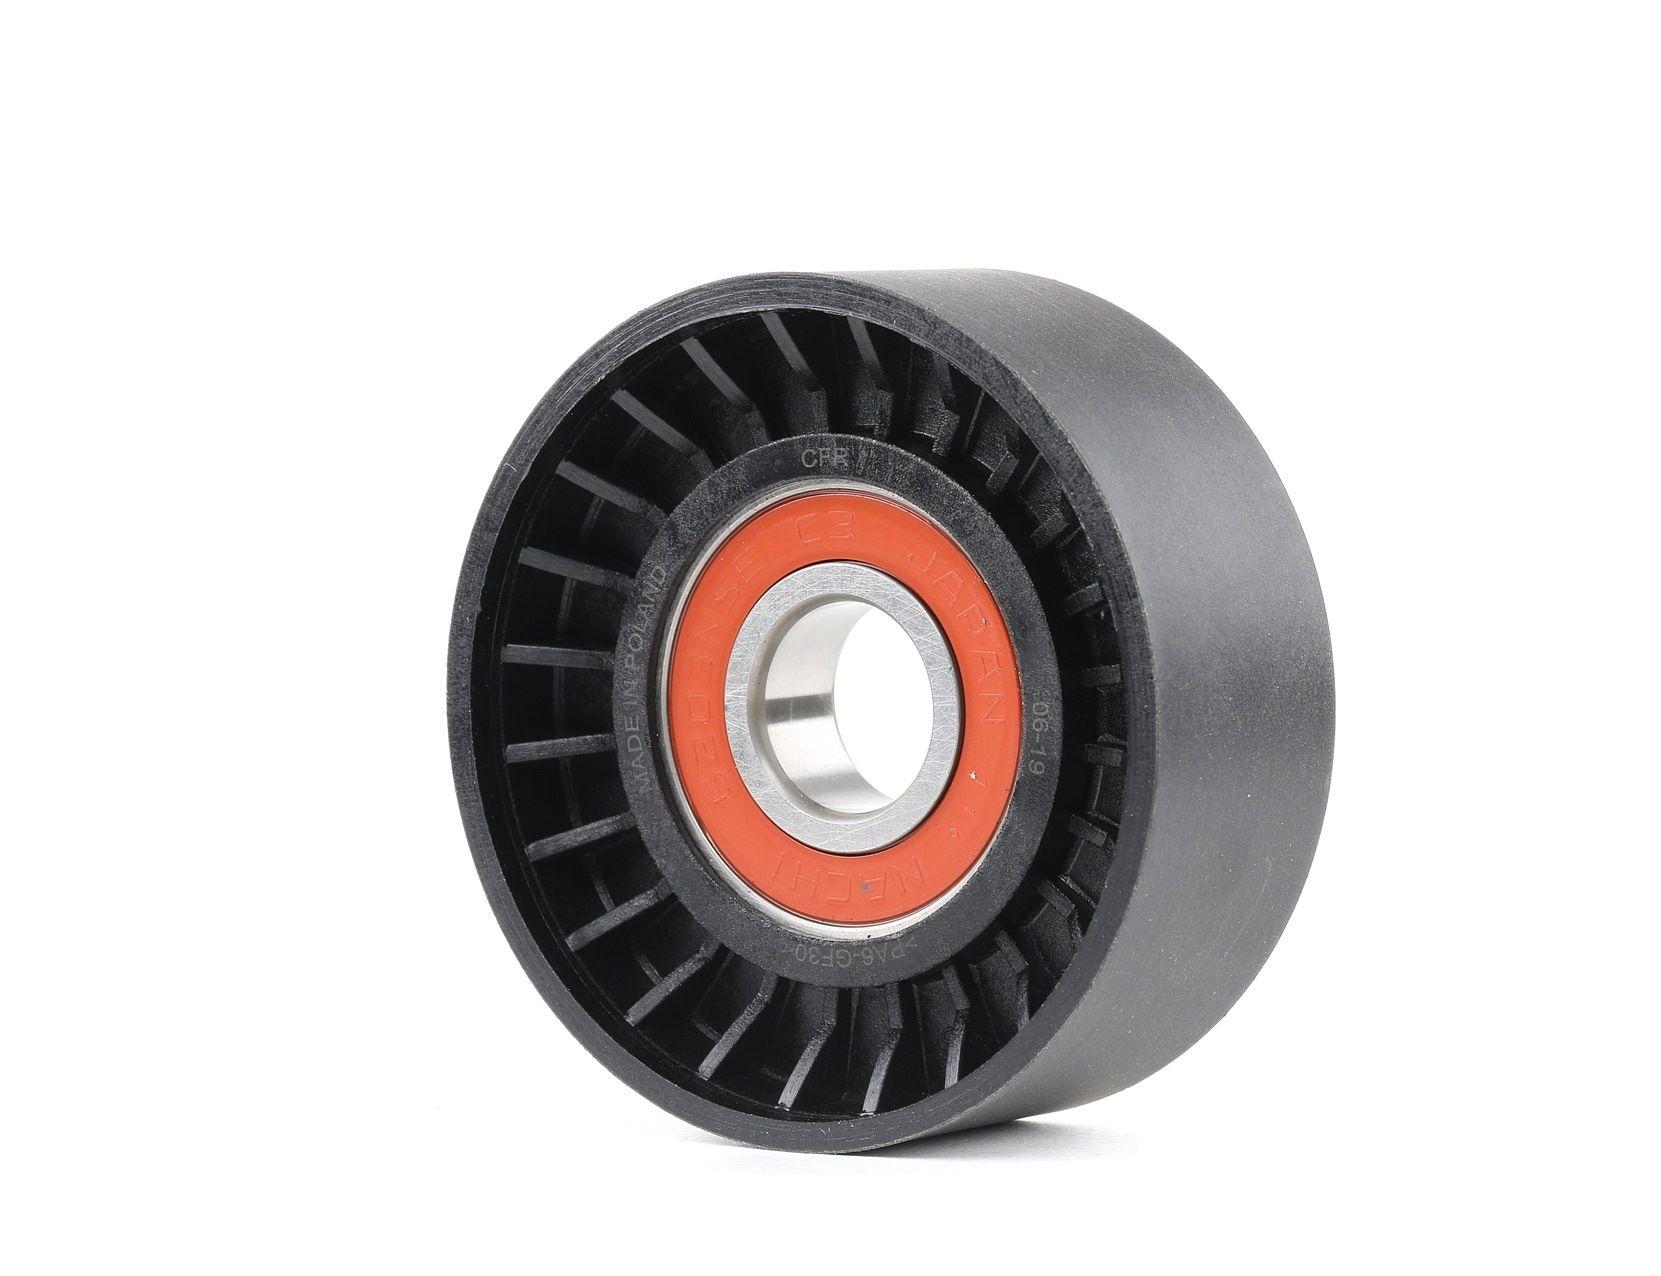 CAFFARO: Original Spannrolle 01-88 (Breite: 26mm)